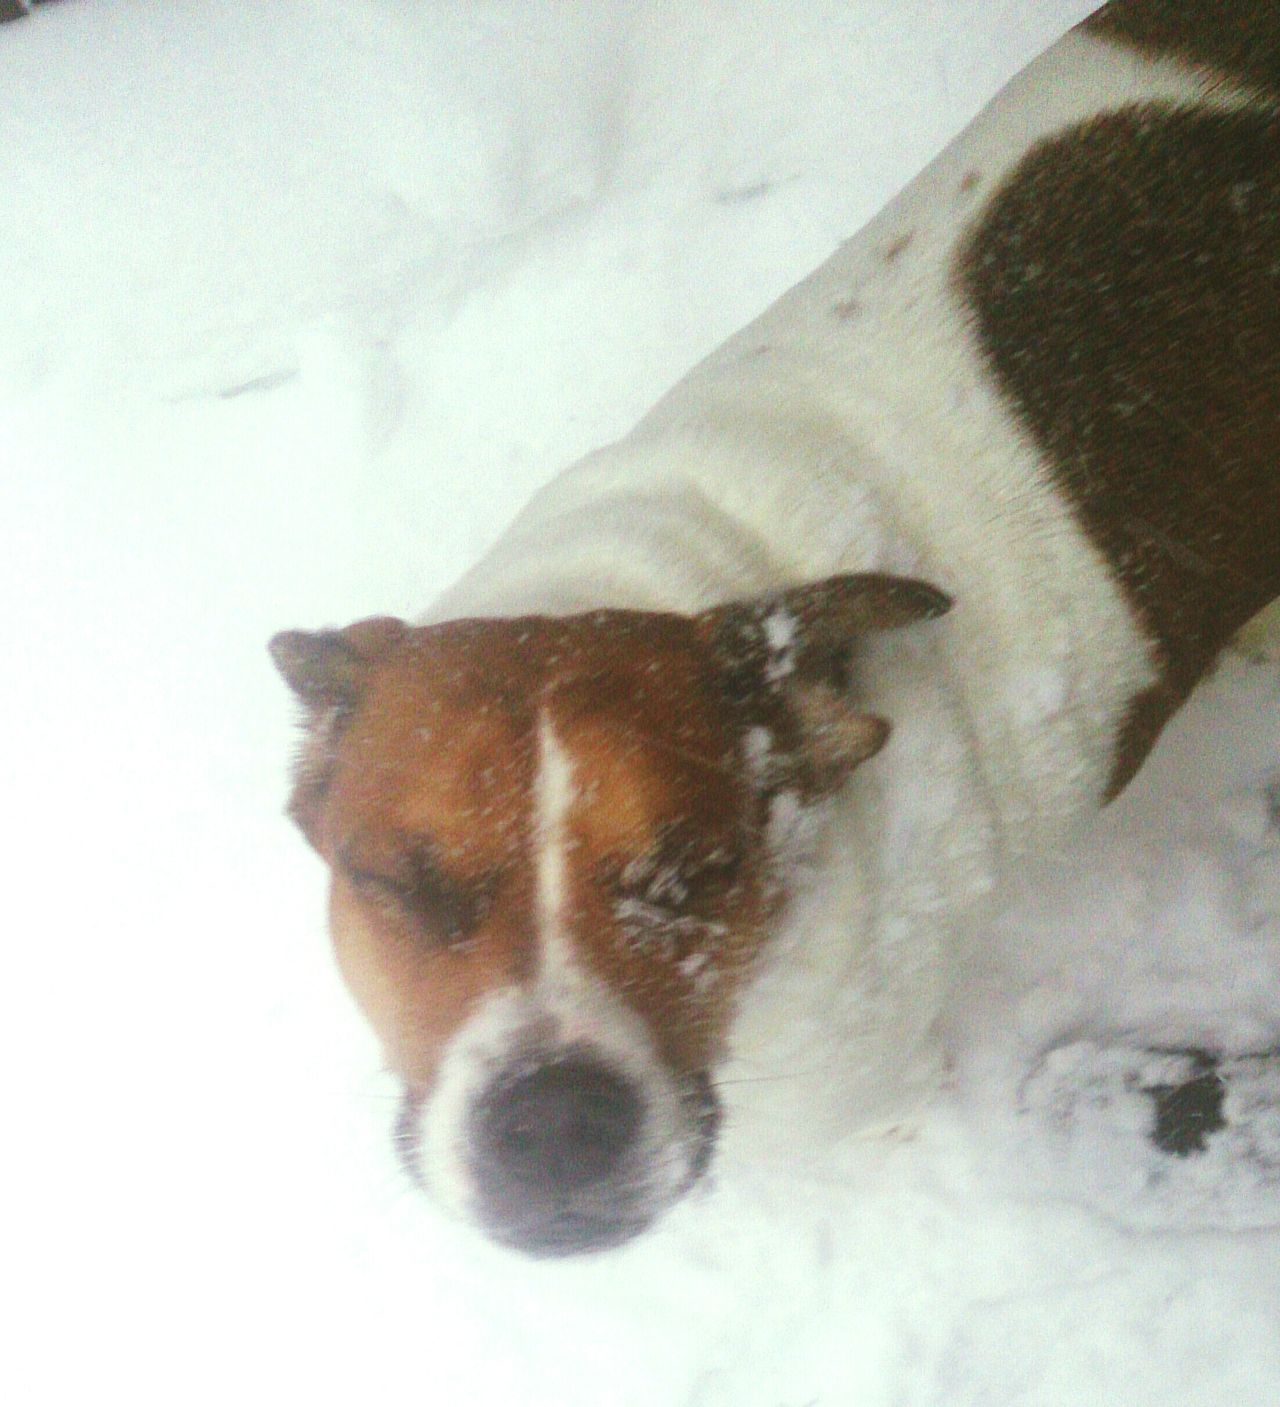 Sammy♡ Beabulls Sammythebeabull Baby ❤ Nature_collection When Boredom Strikes. Snow❄⛄ Snowy Snow Snowing Snow ❄ Winter LongIslandNY